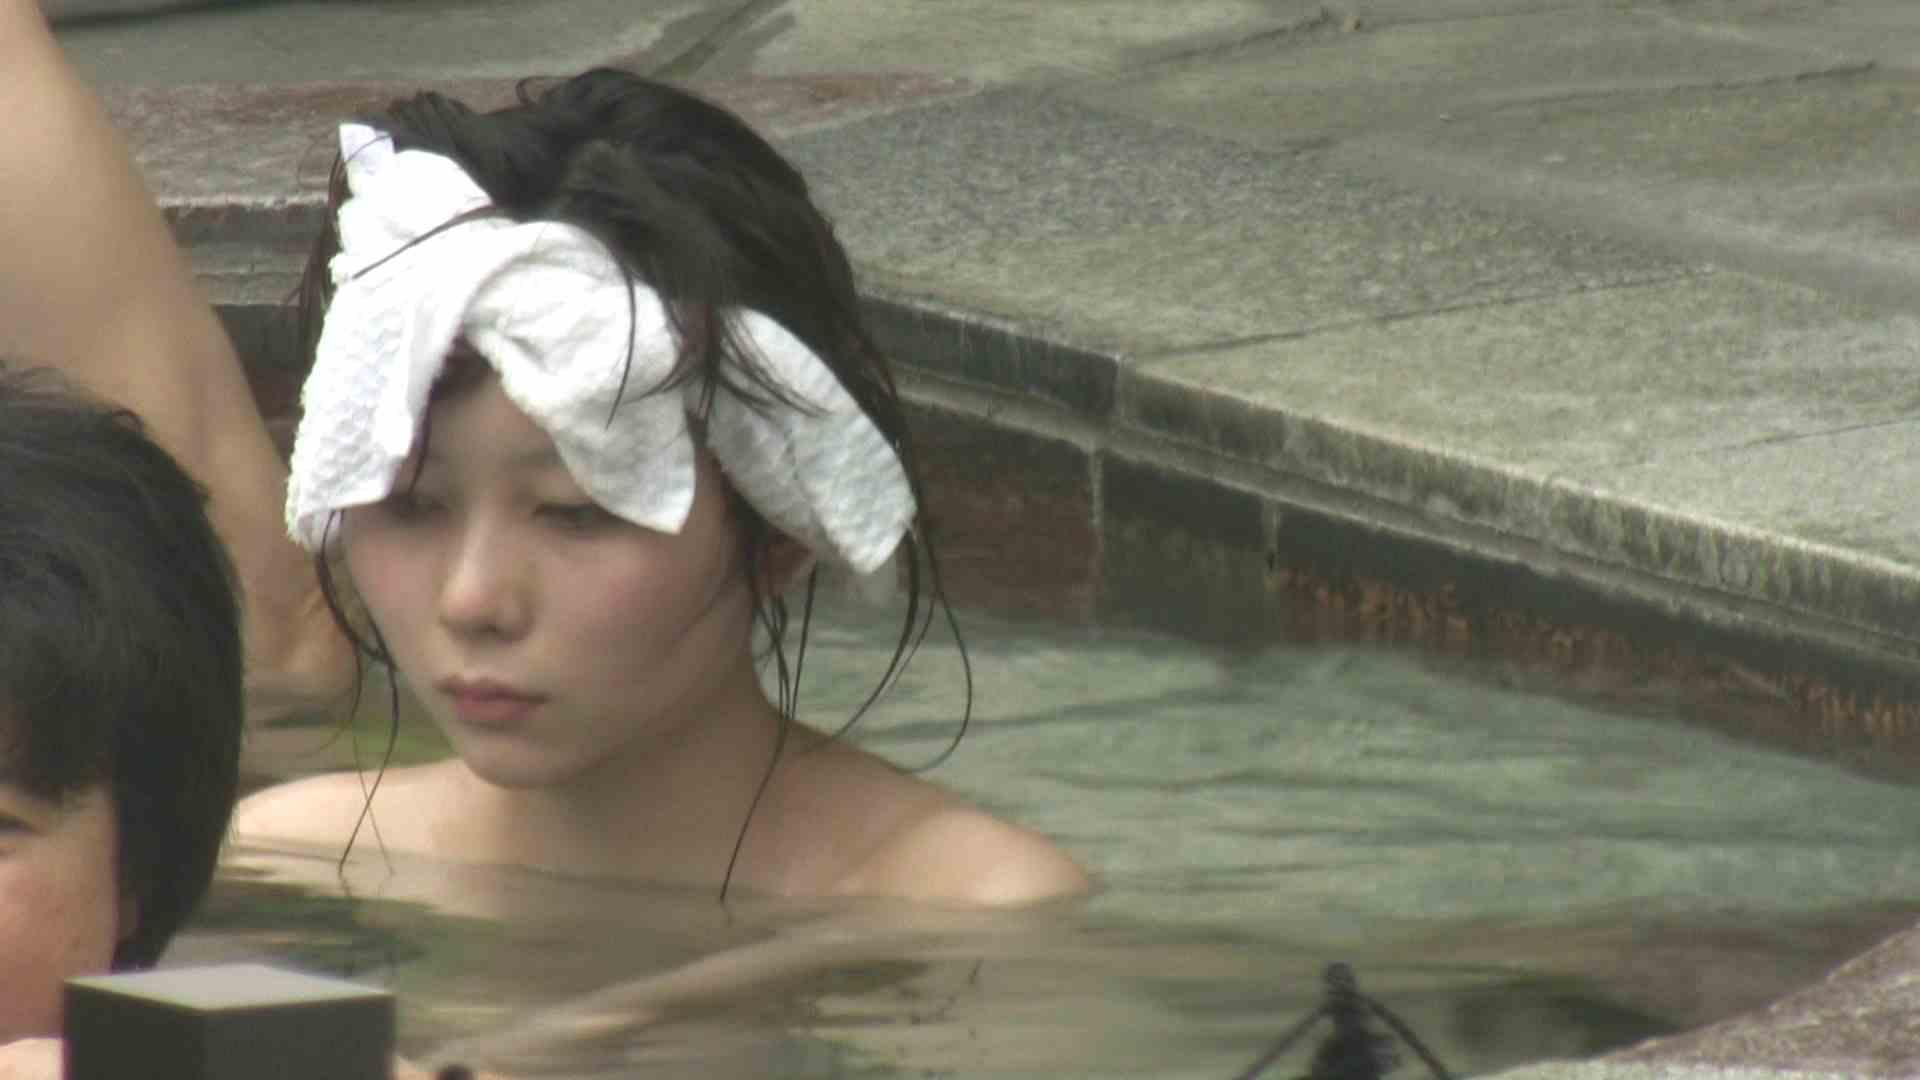 Aquaな露天風呂Vol.147 露天 濡れ場動画紹介 85画像 17